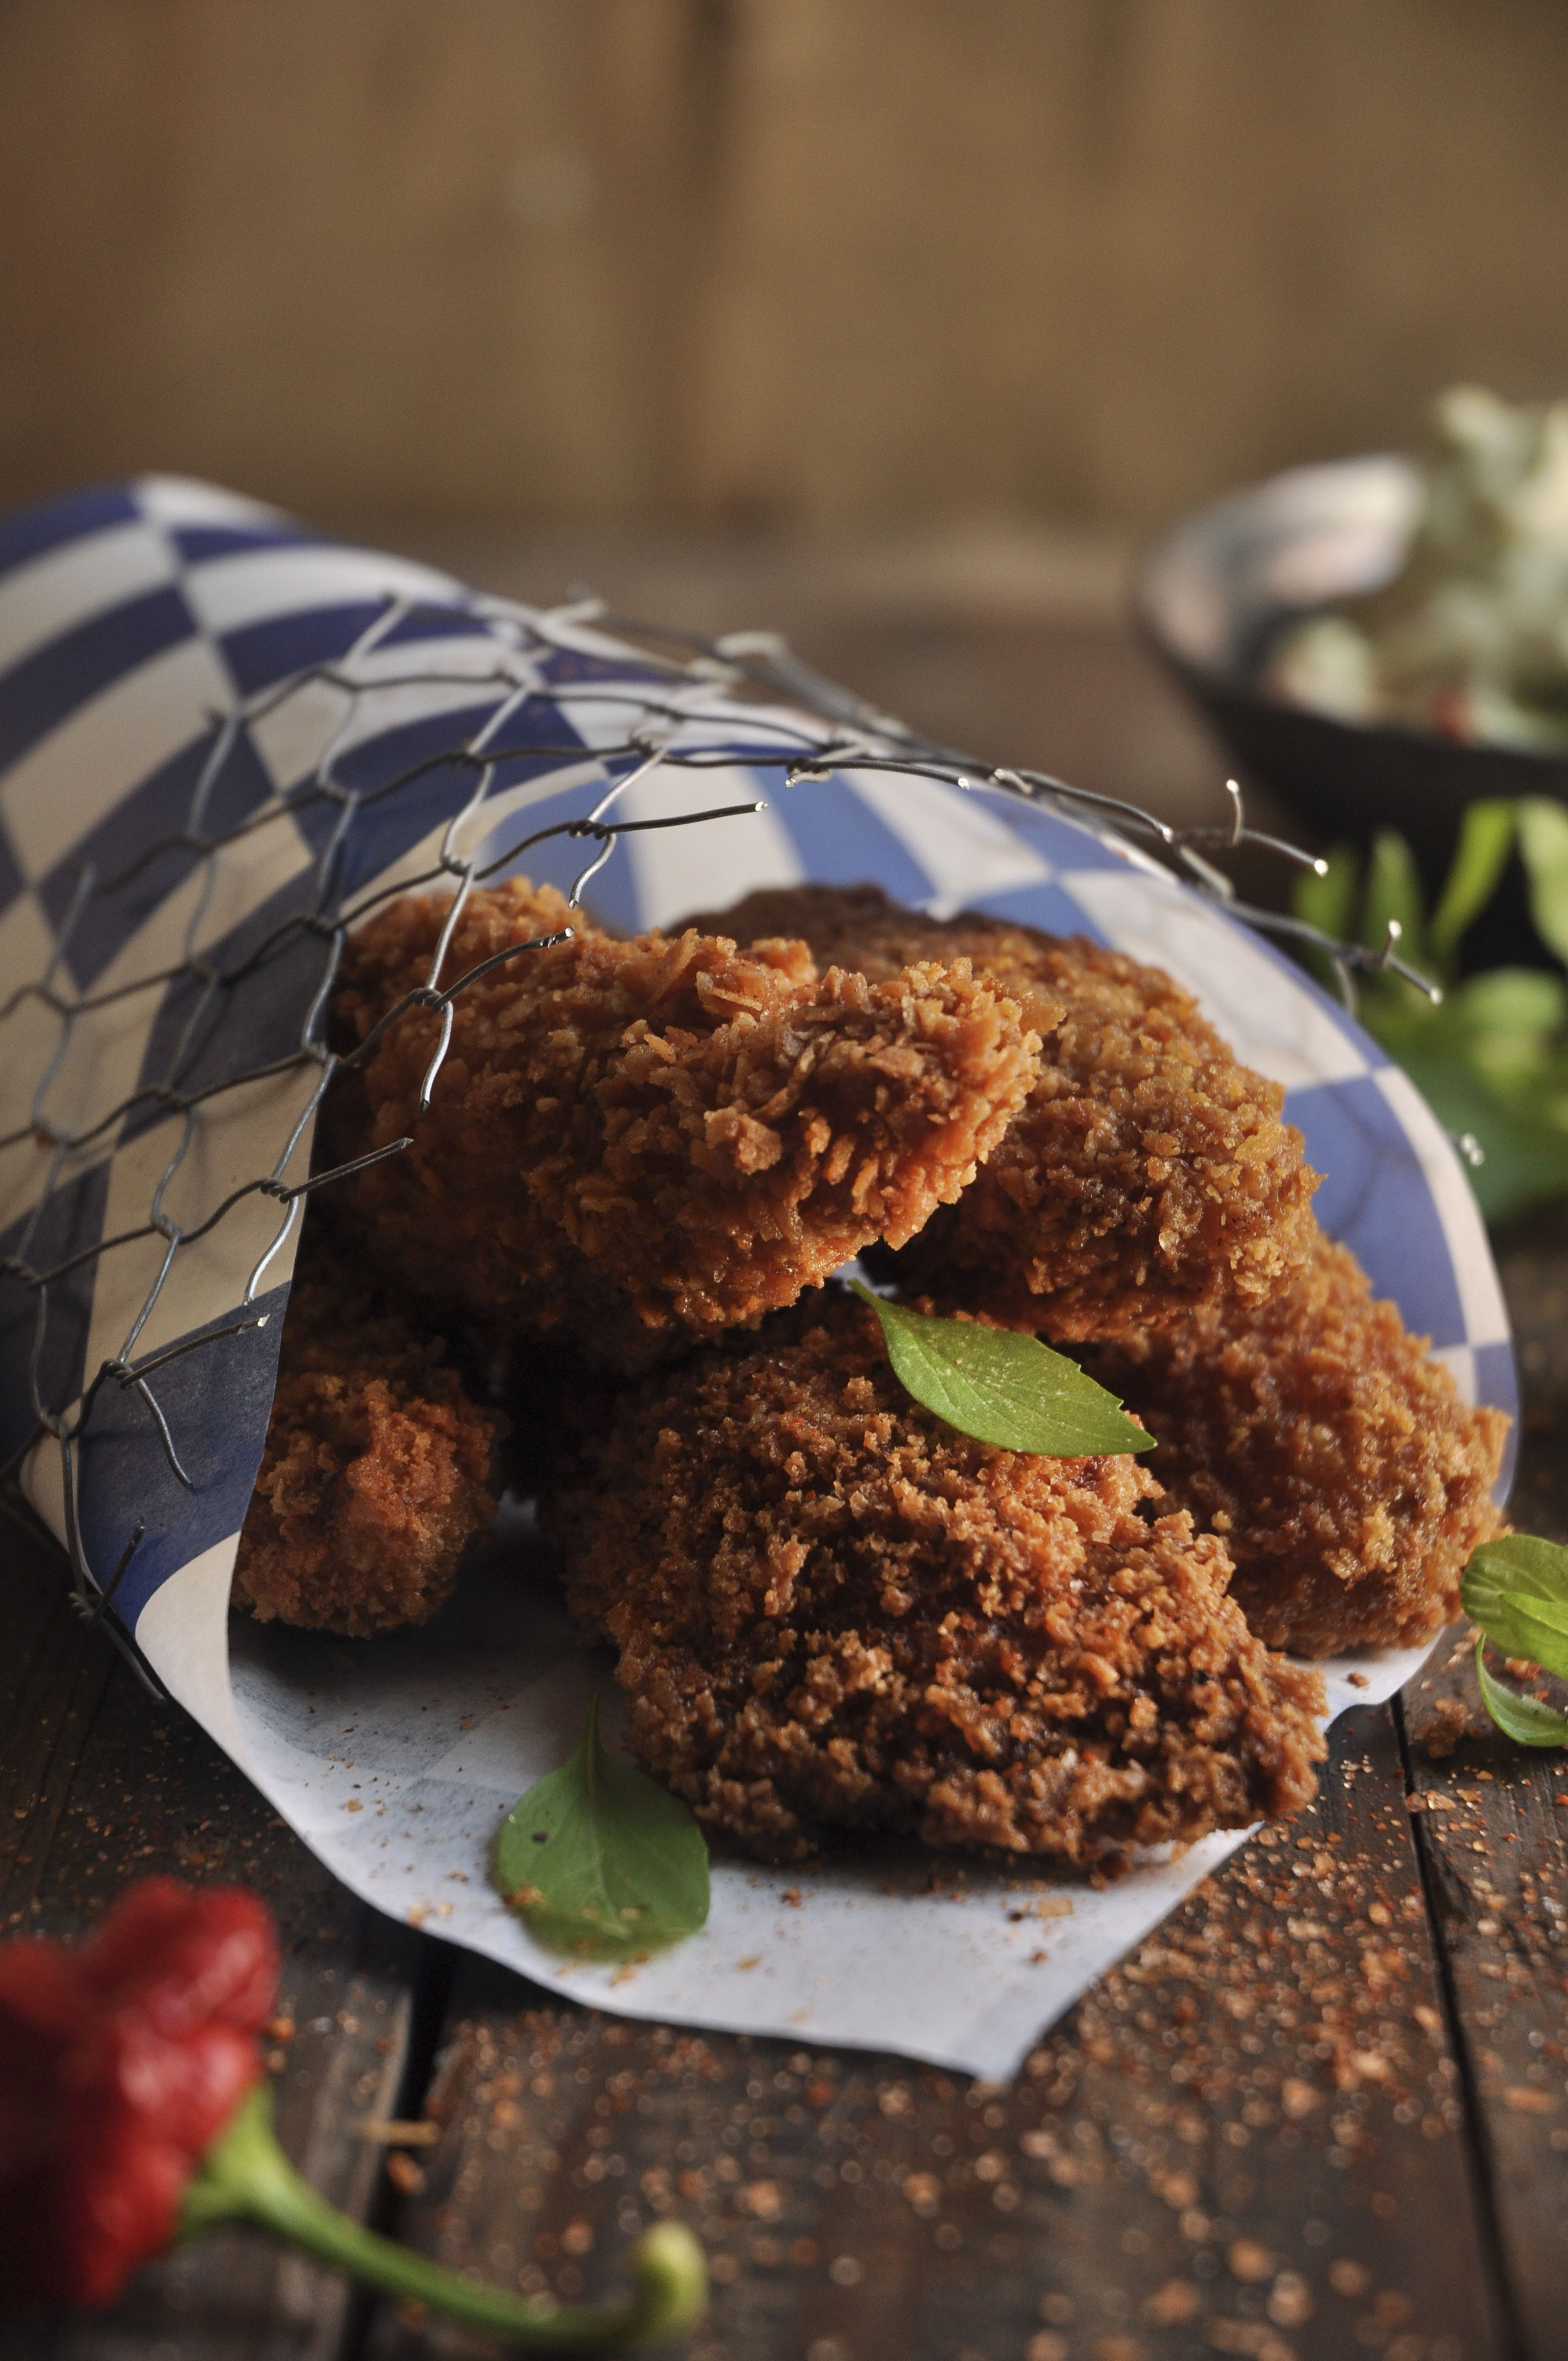 Crispy crunchy buffalo wing